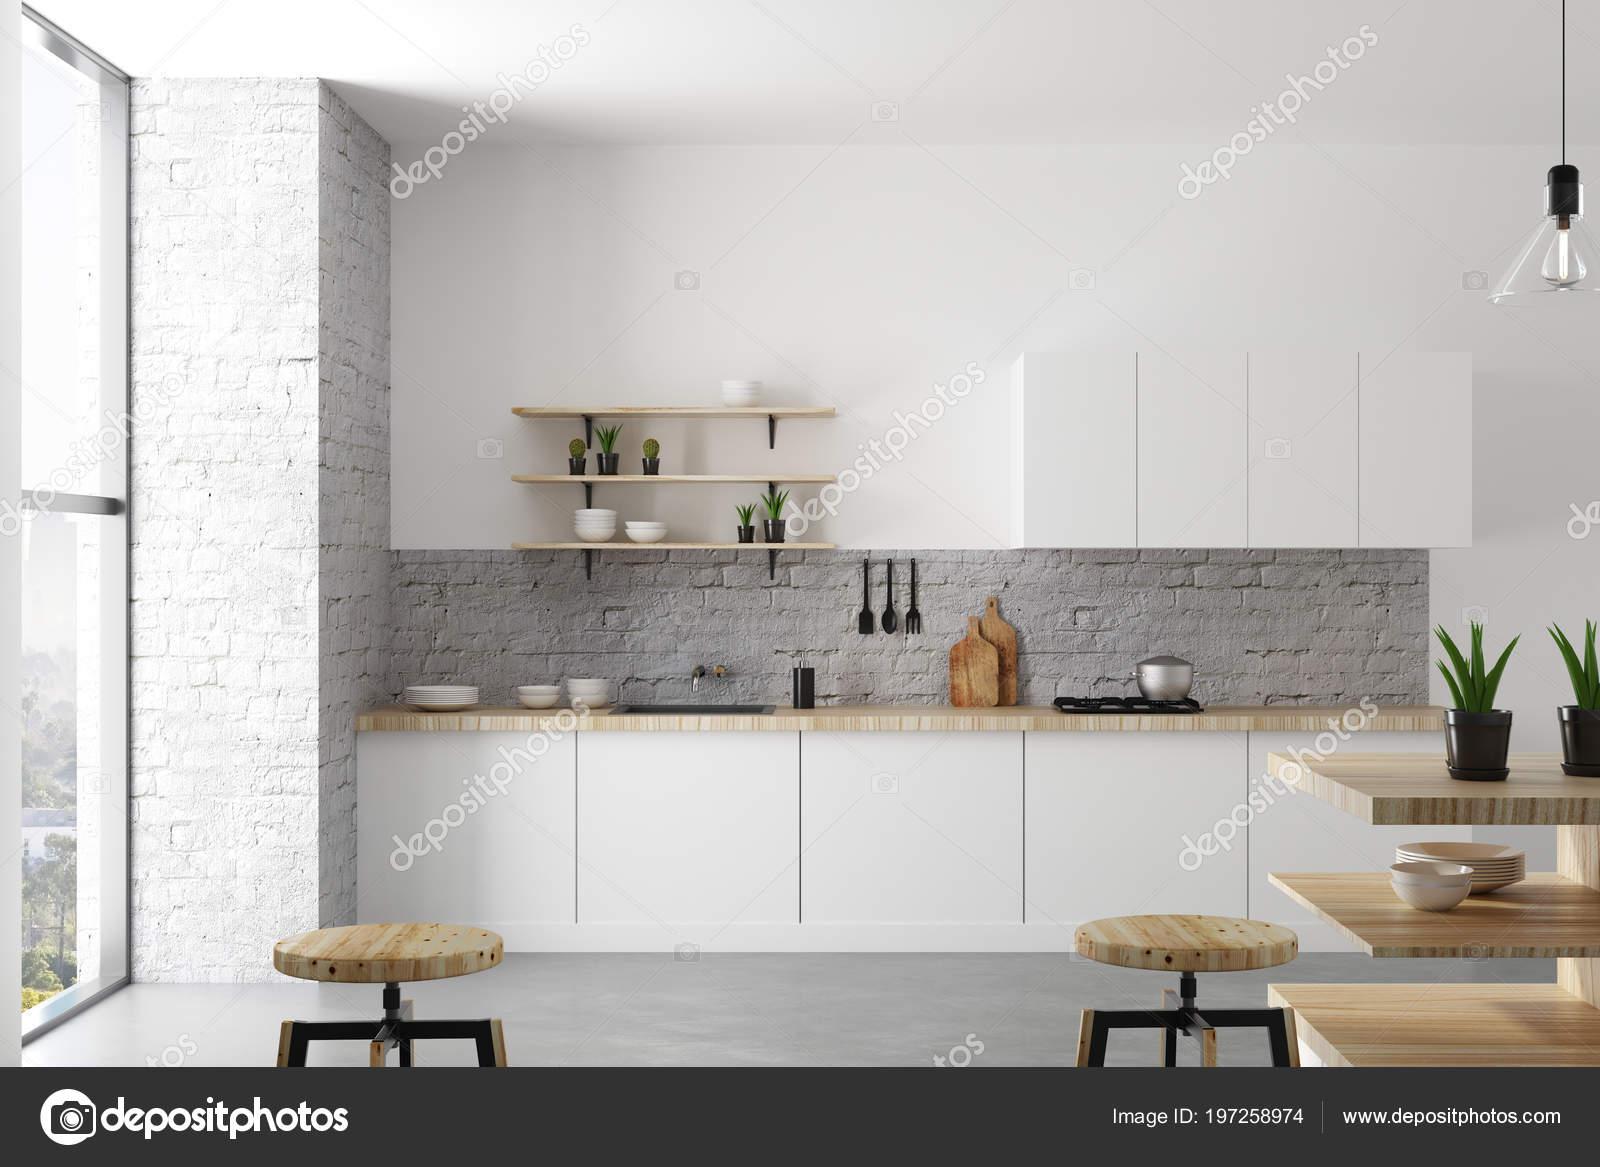 Daglicht Je Keuken : Schone lichte loft keuken interieur met meubels apparaten daglicht